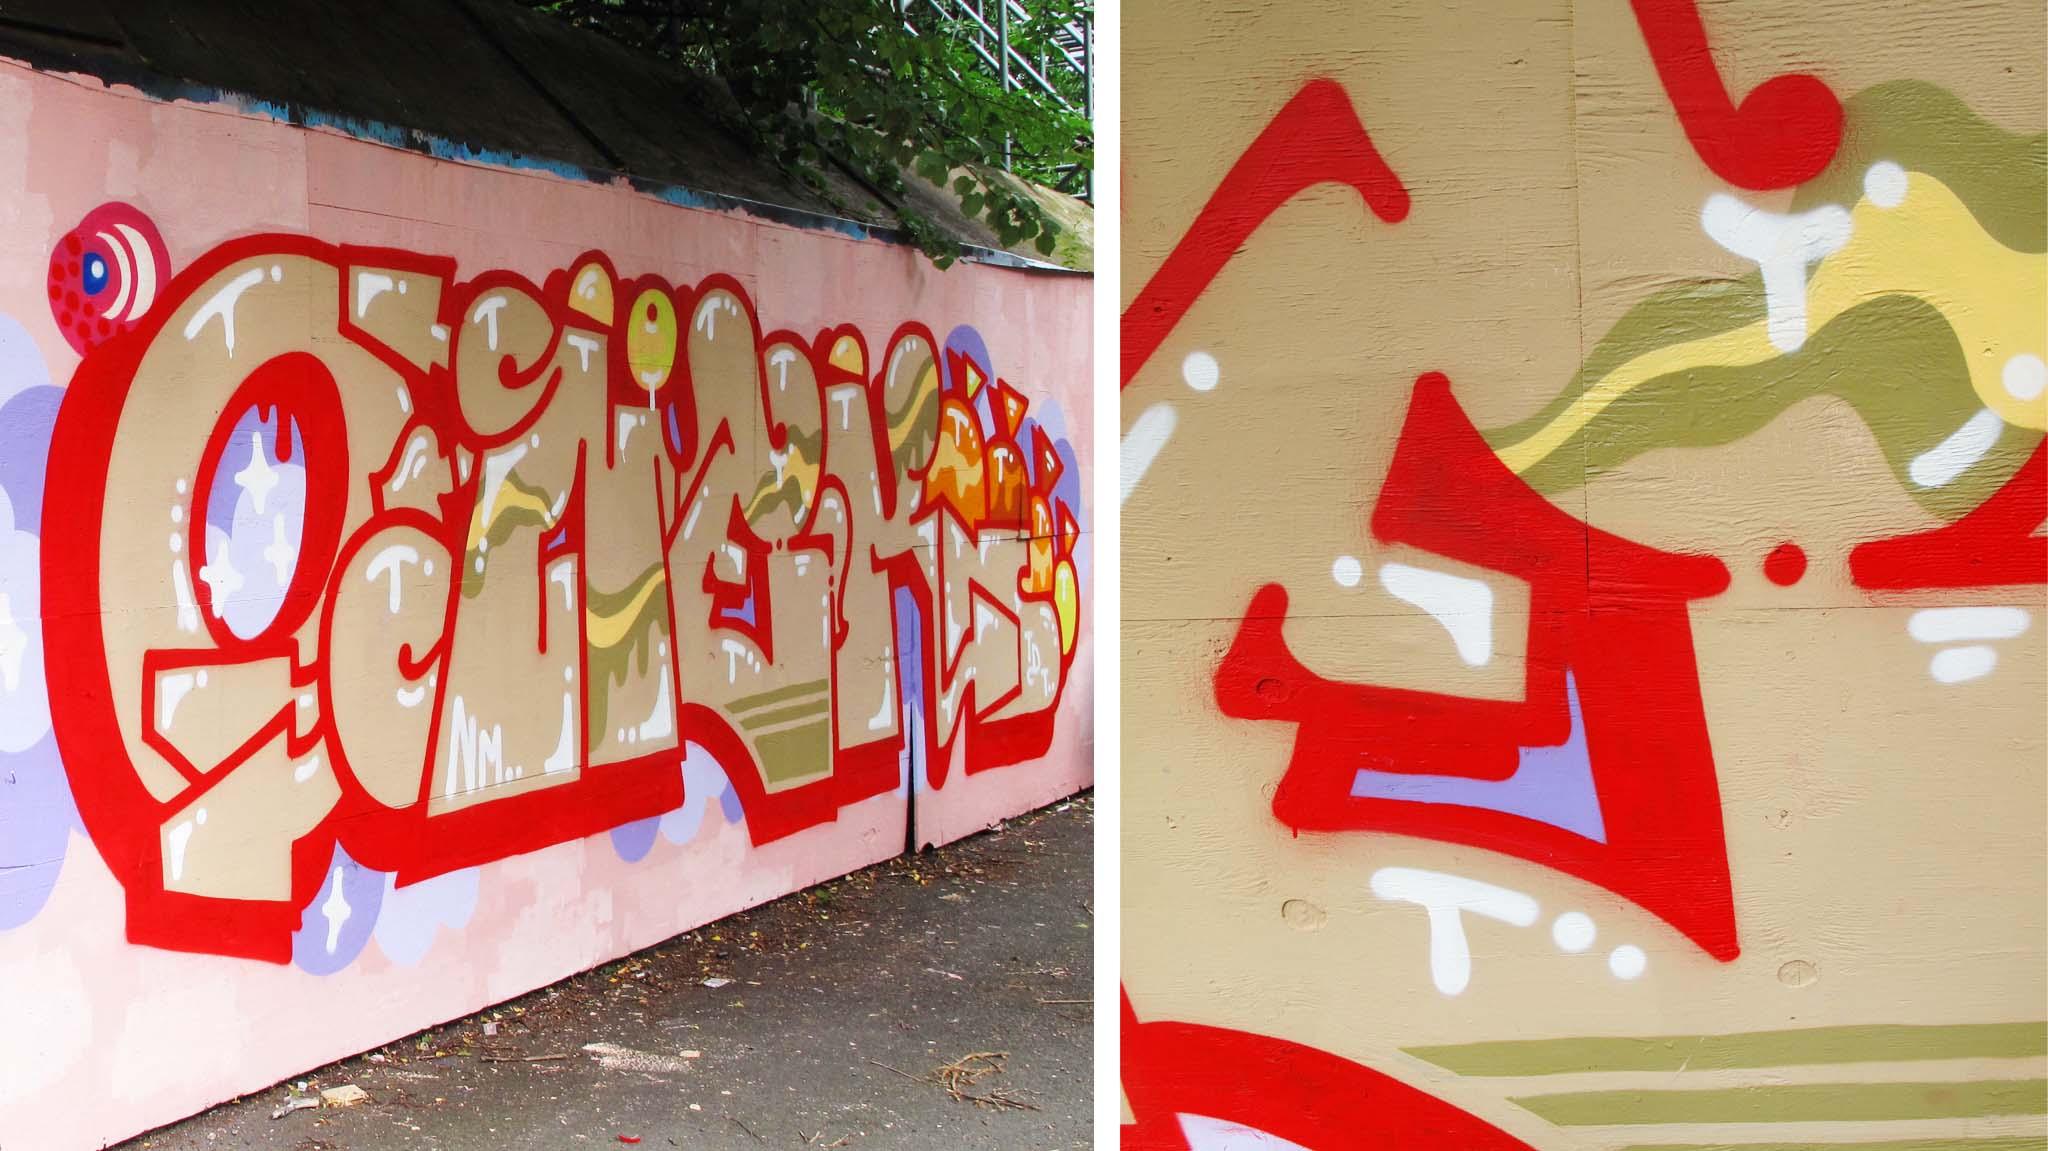 onek nm graffitti manchester england uk